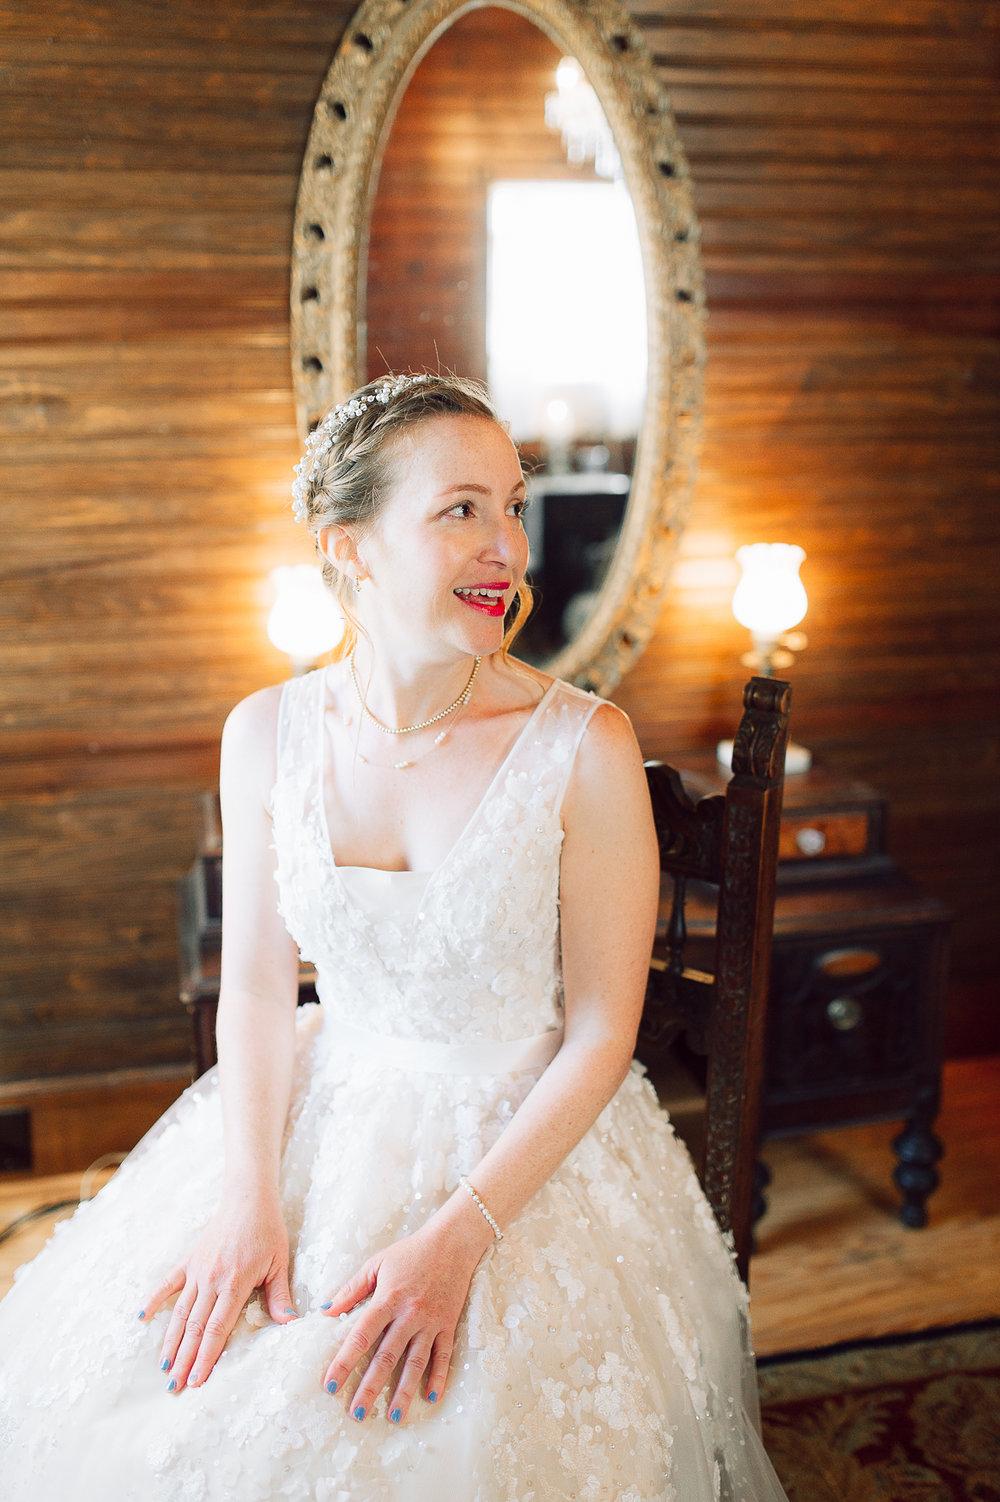 virginiawedding_theGlasgowFarm_rusticwedding_fredericksburg_youseephotography_CarolineDale (24).jpg